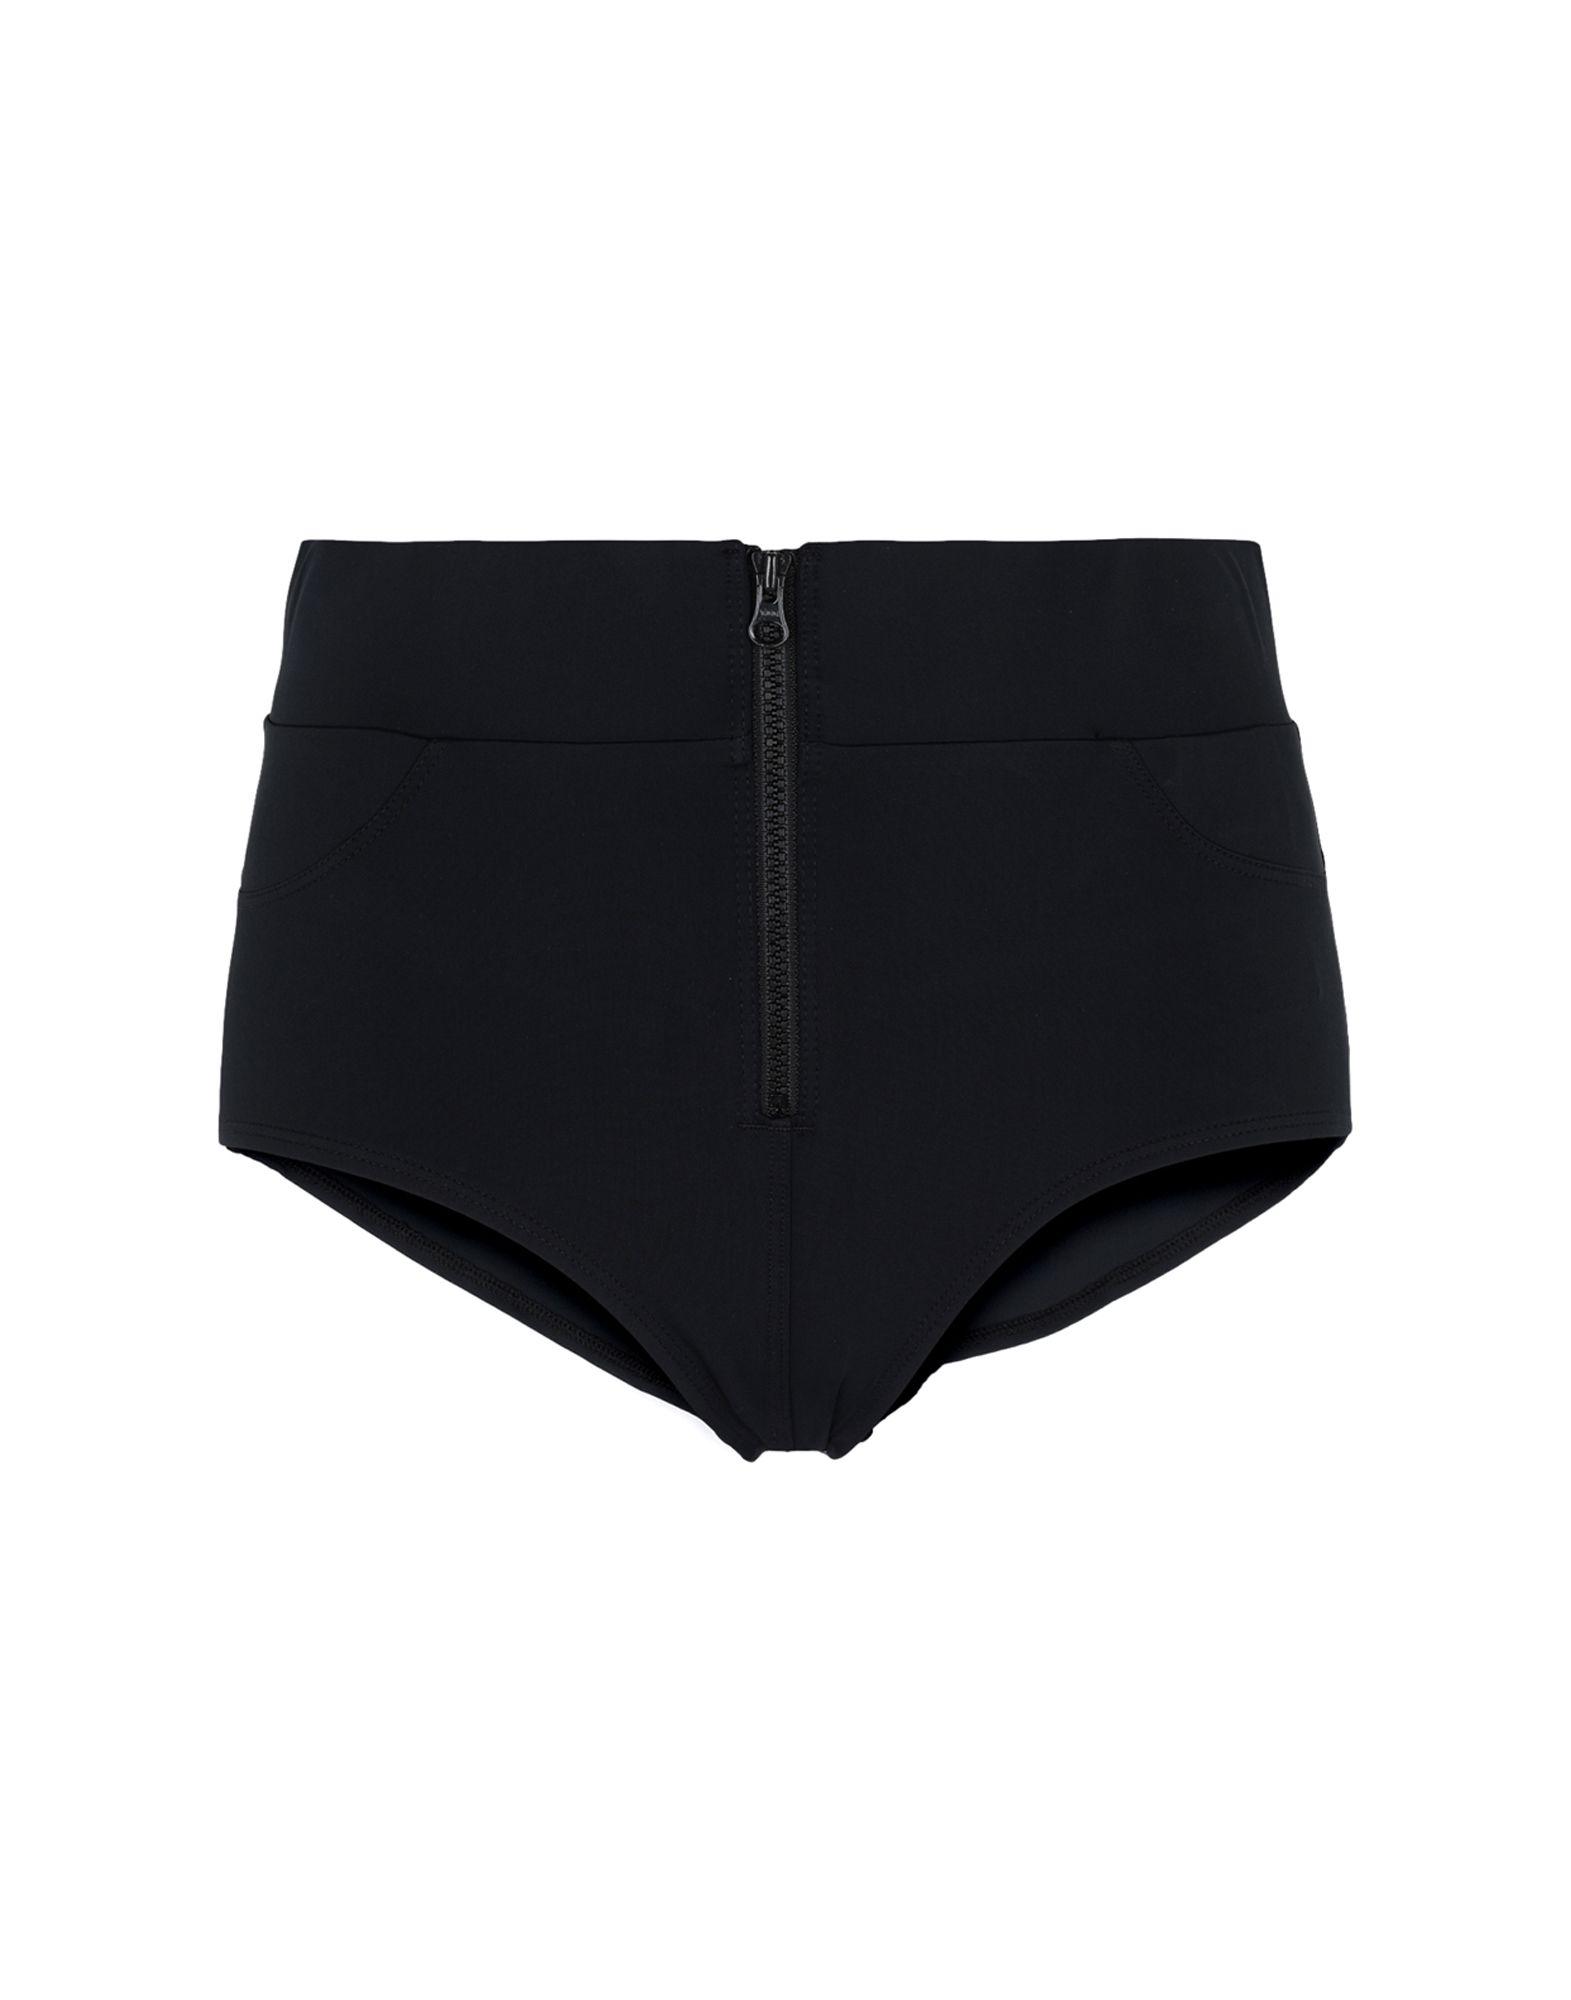 ADIDAS by STELLA McCARTNEY Повседневные шорты шорты для единоборств adidas training short mma черно желтые adimmas01